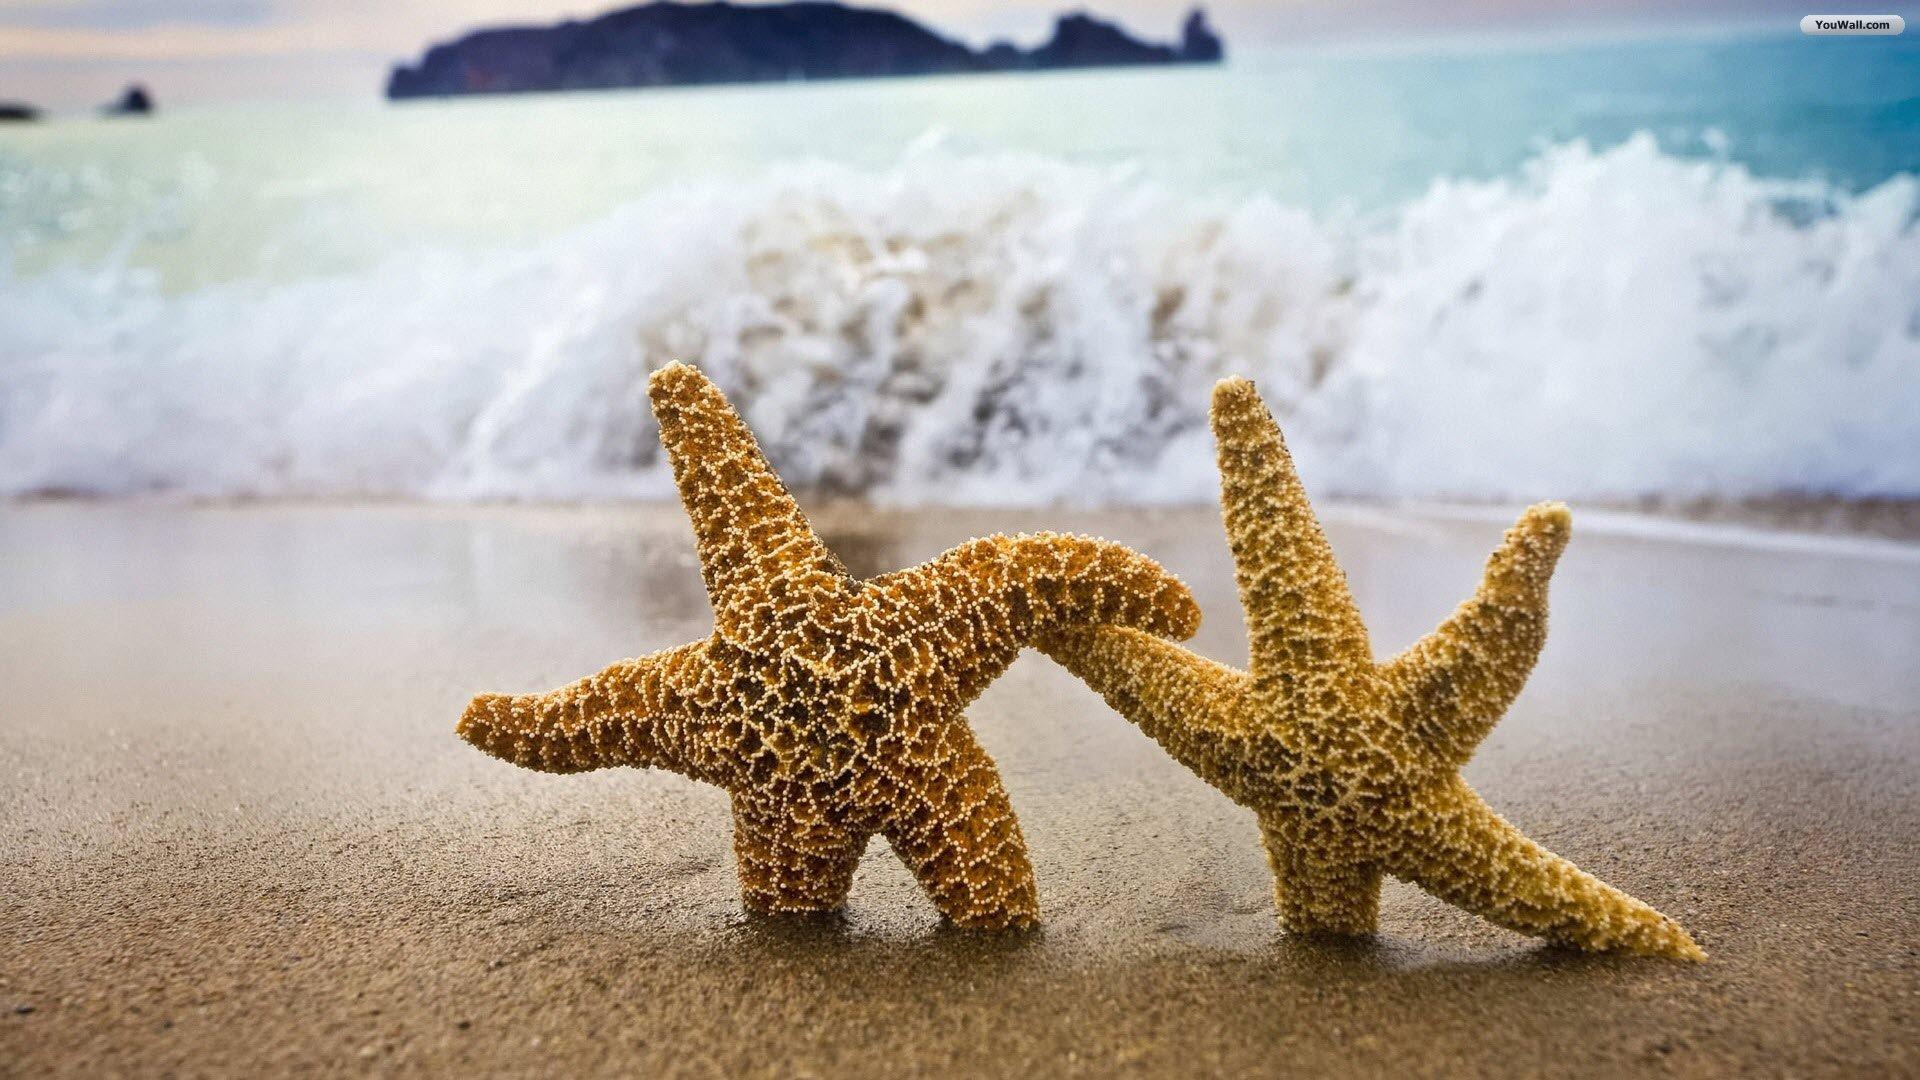 beach-stars-wallpaper